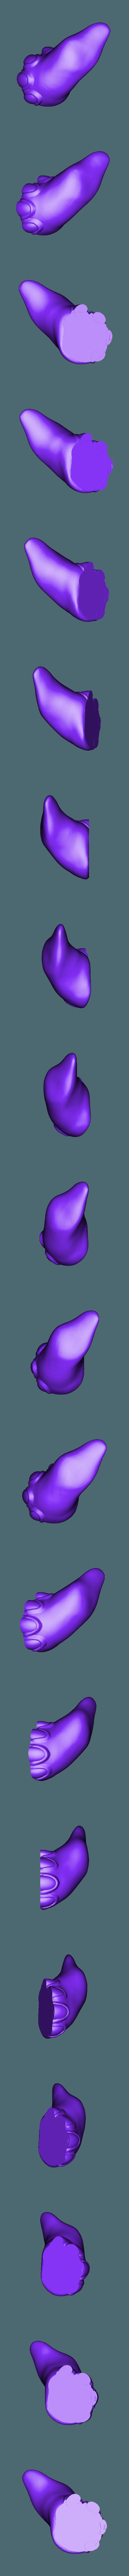 patte AR.stl Download STL file Turtle • 3D print model, didoff